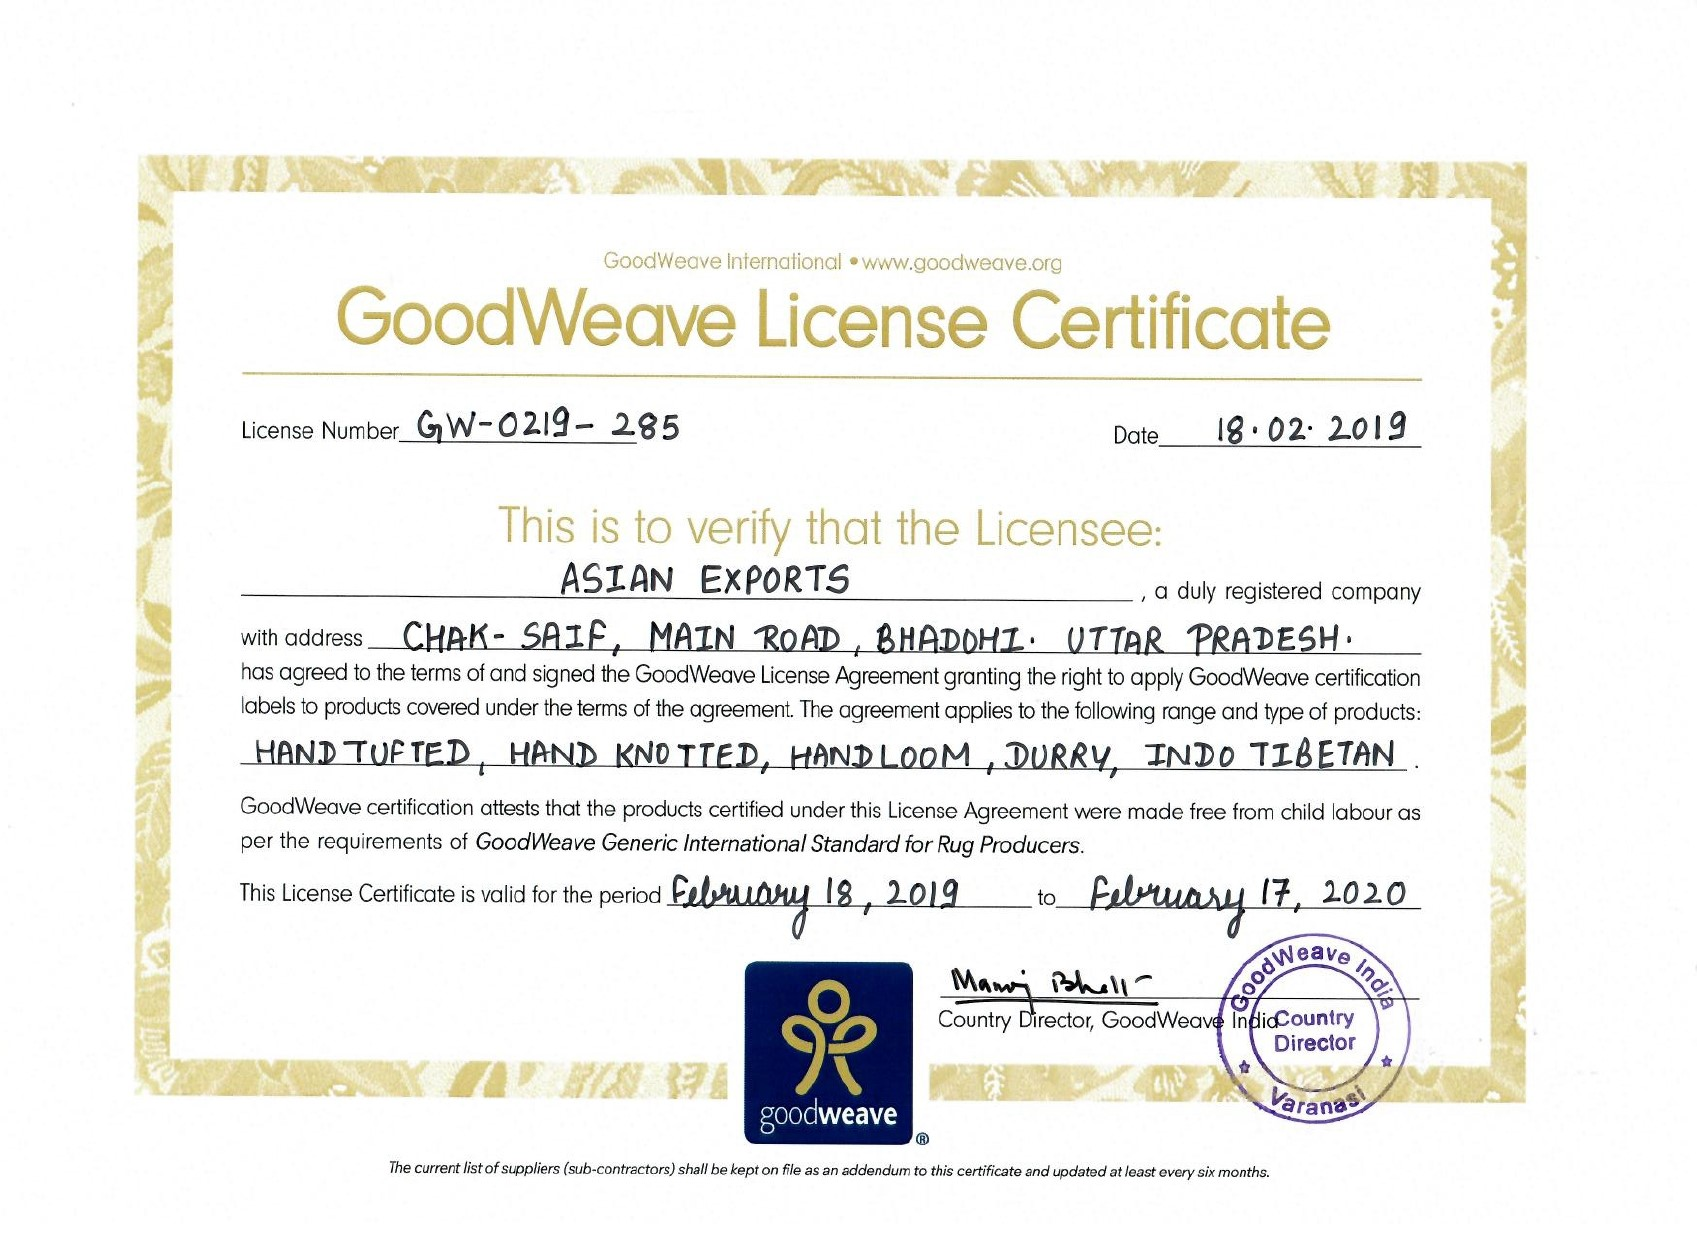 Goodweave License Certificate